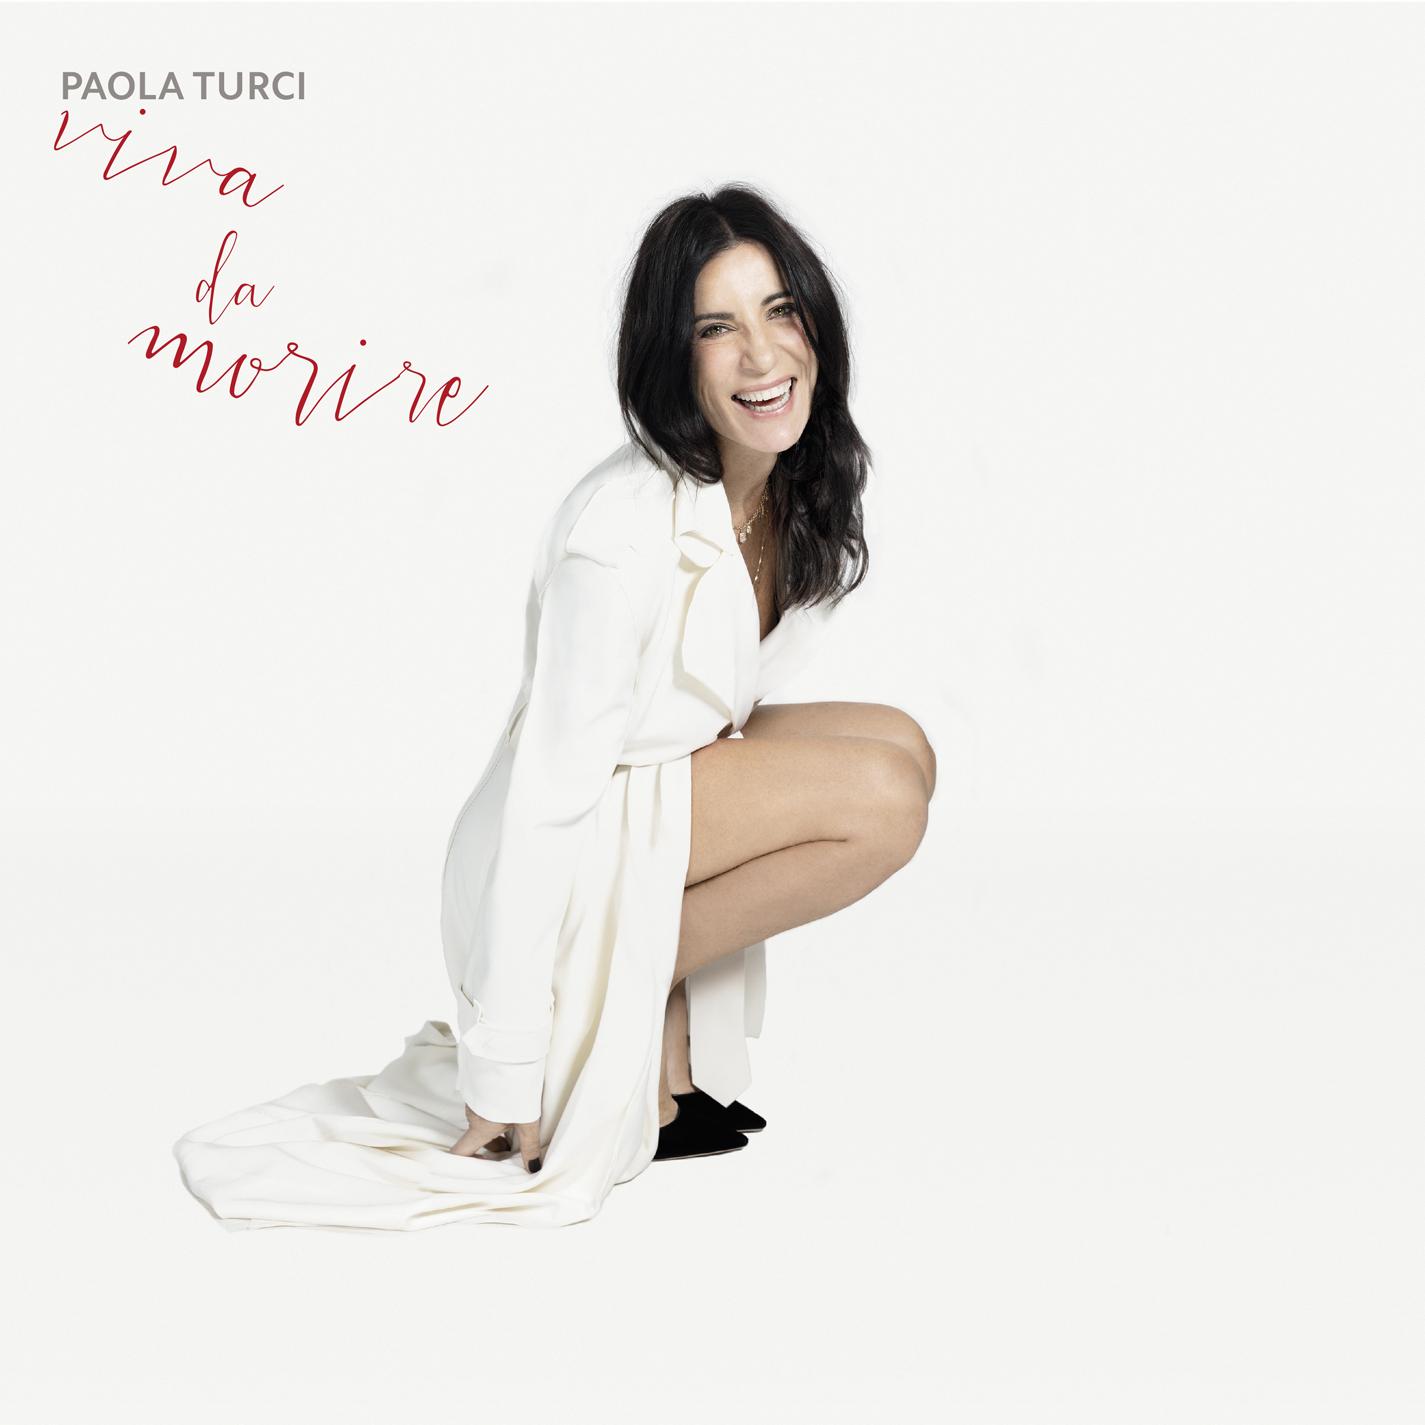 Paola Turci_Viva da morire